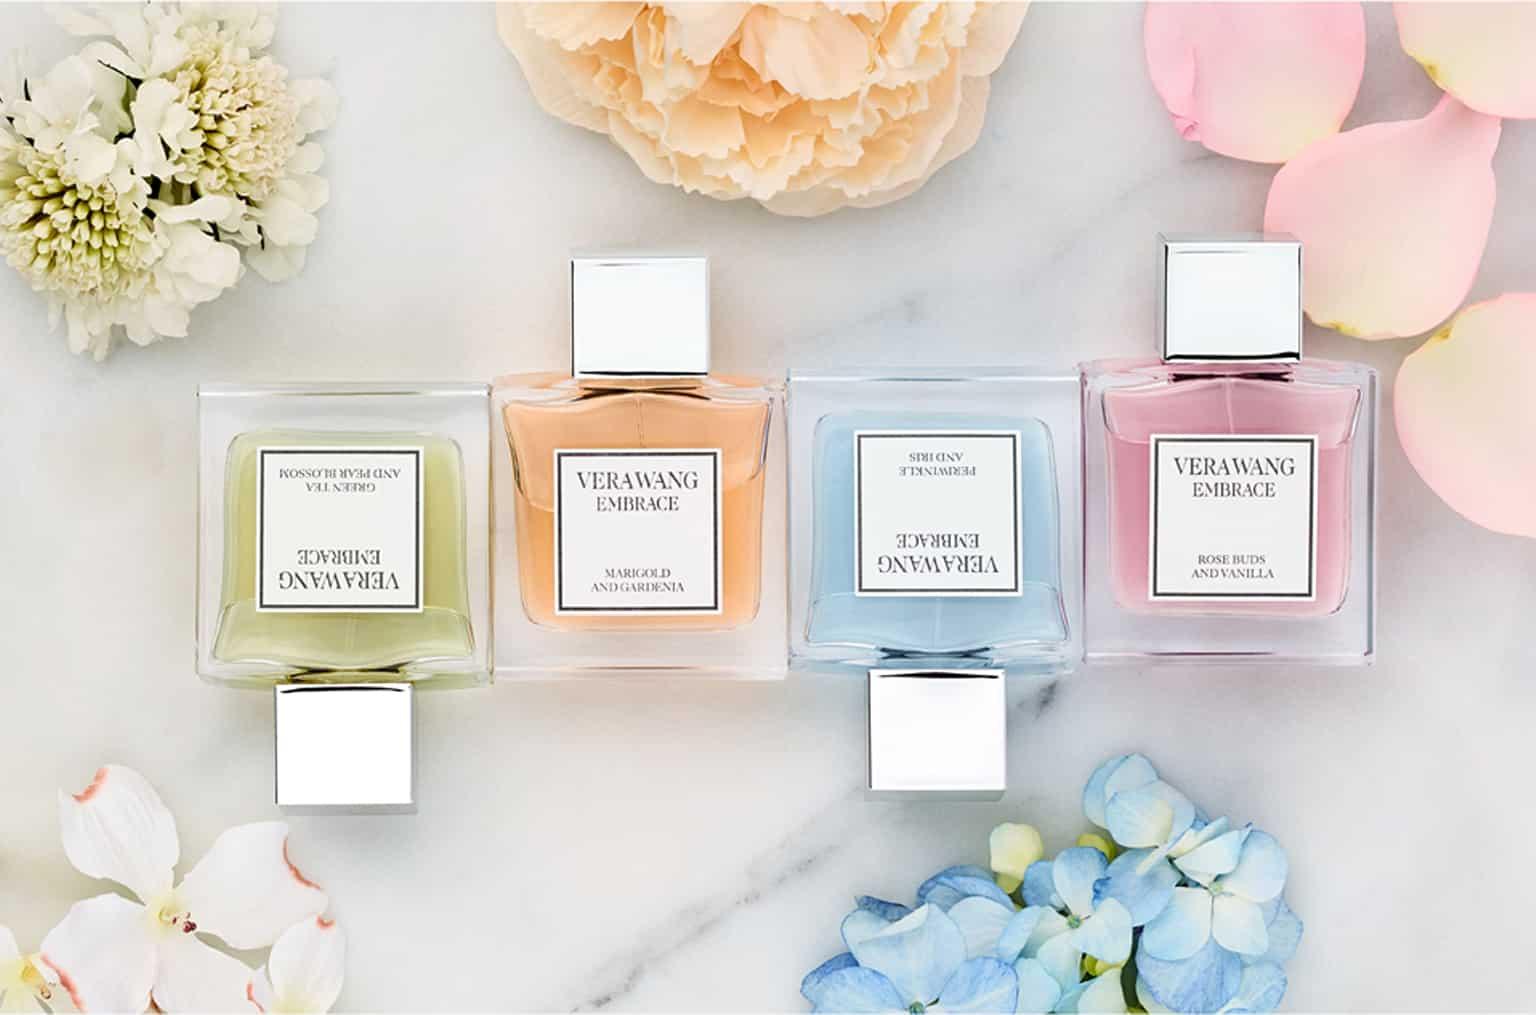 vera wang embrace collection perfume